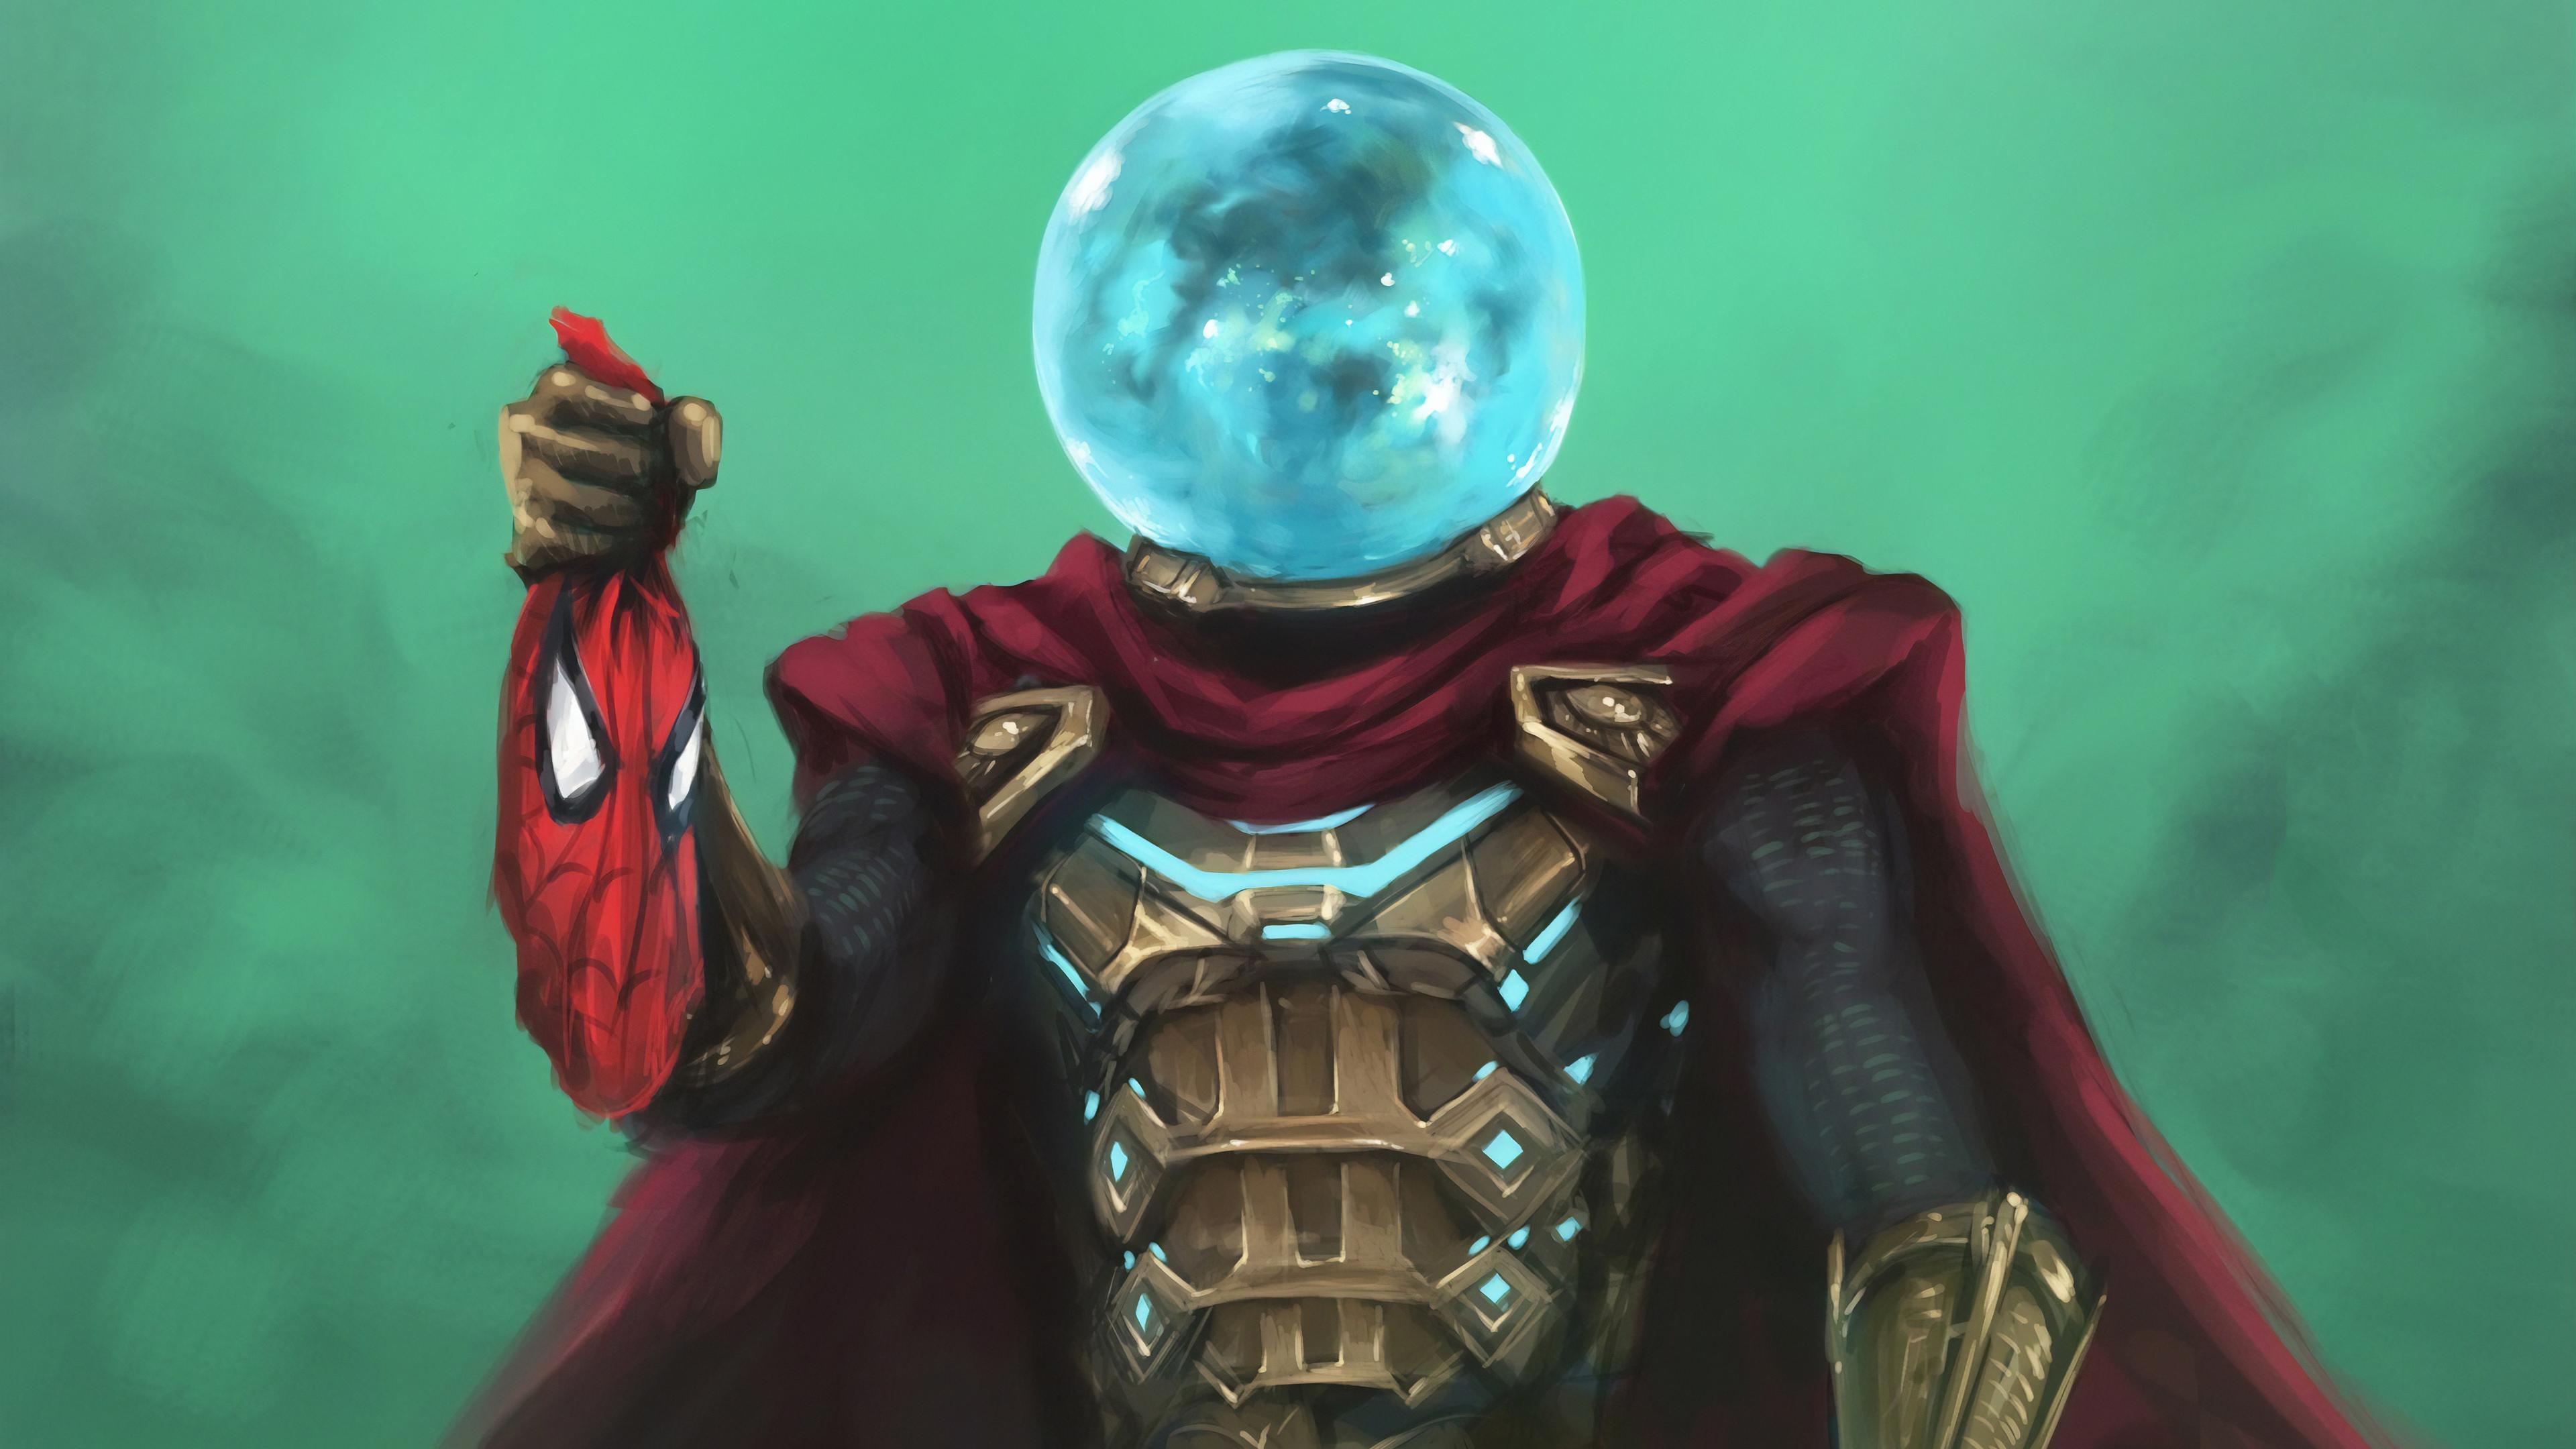 mysterio hand on spiderman mask 1572368681 - Mysterio Hand On Spiderman Mask - superheroes wallpapers, mysterio wallpapers, hd-wallpapers, artwork wallpapers, 4k-wallpapers